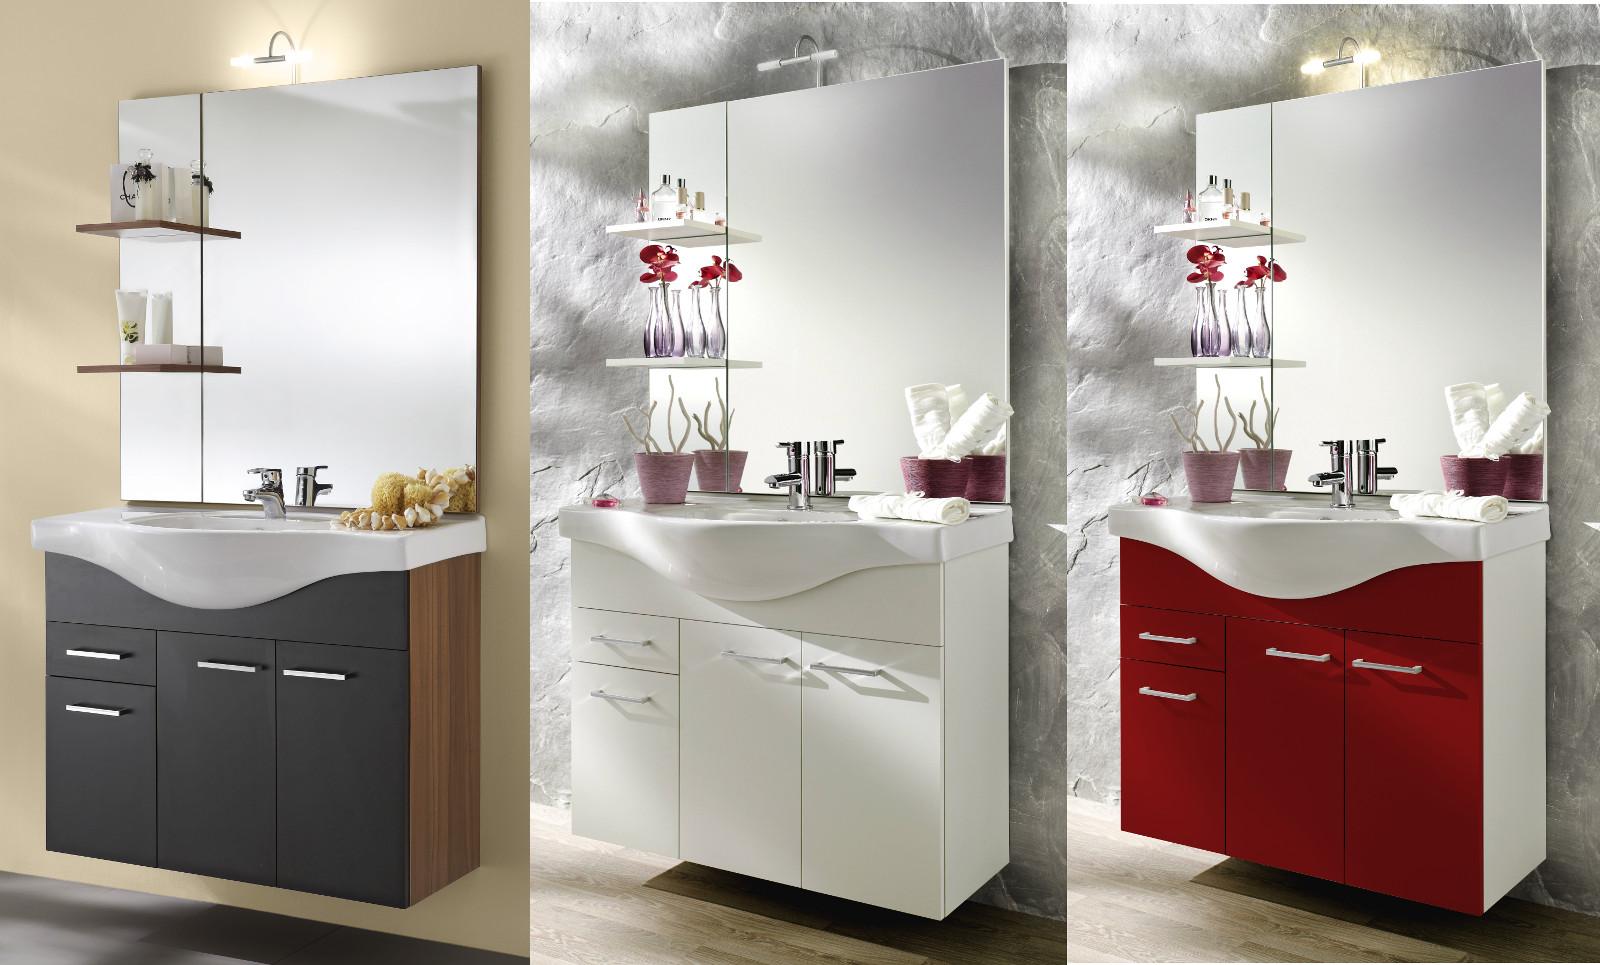 waschplatz inkl keramikbecken und beleuchtung. Black Bedroom Furniture Sets. Home Design Ideas